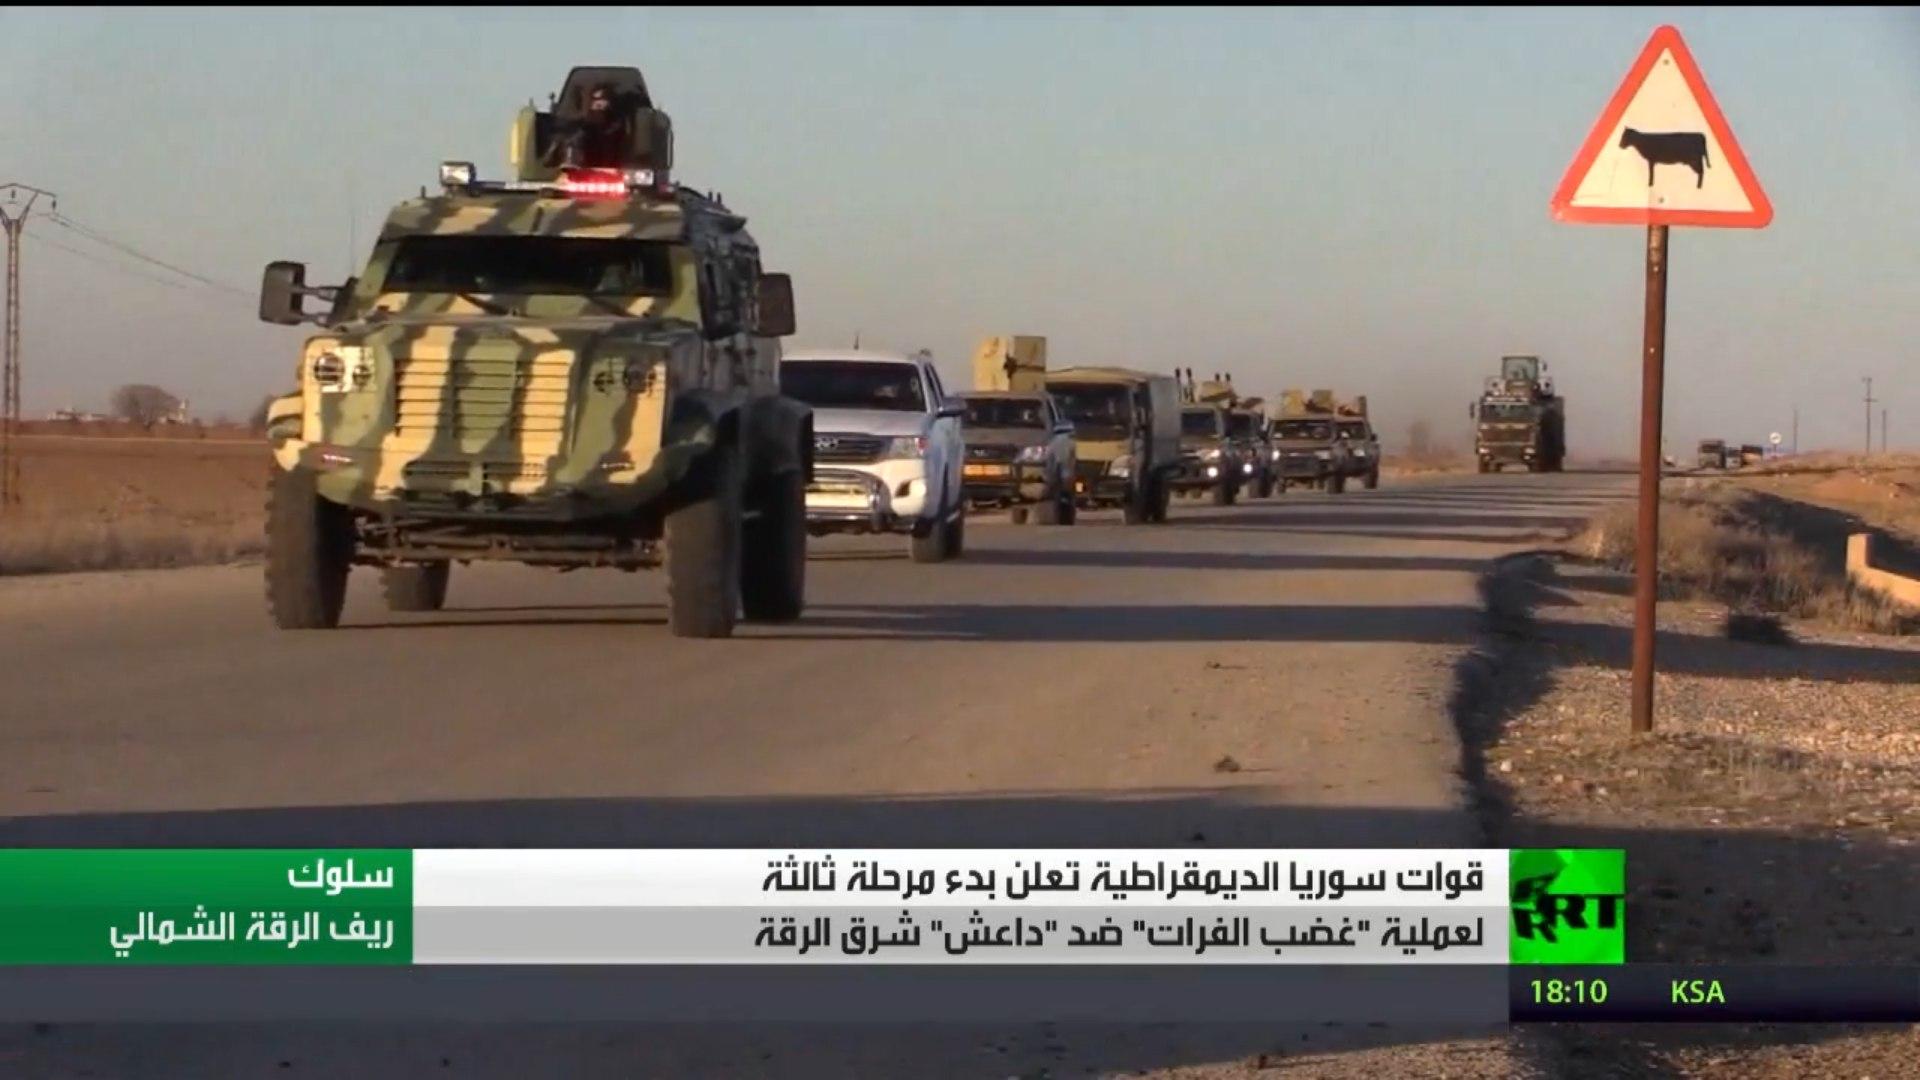 [BIZTPOL] Szíria és Irak - 3. - Page 22 G1l_UYj8aKM